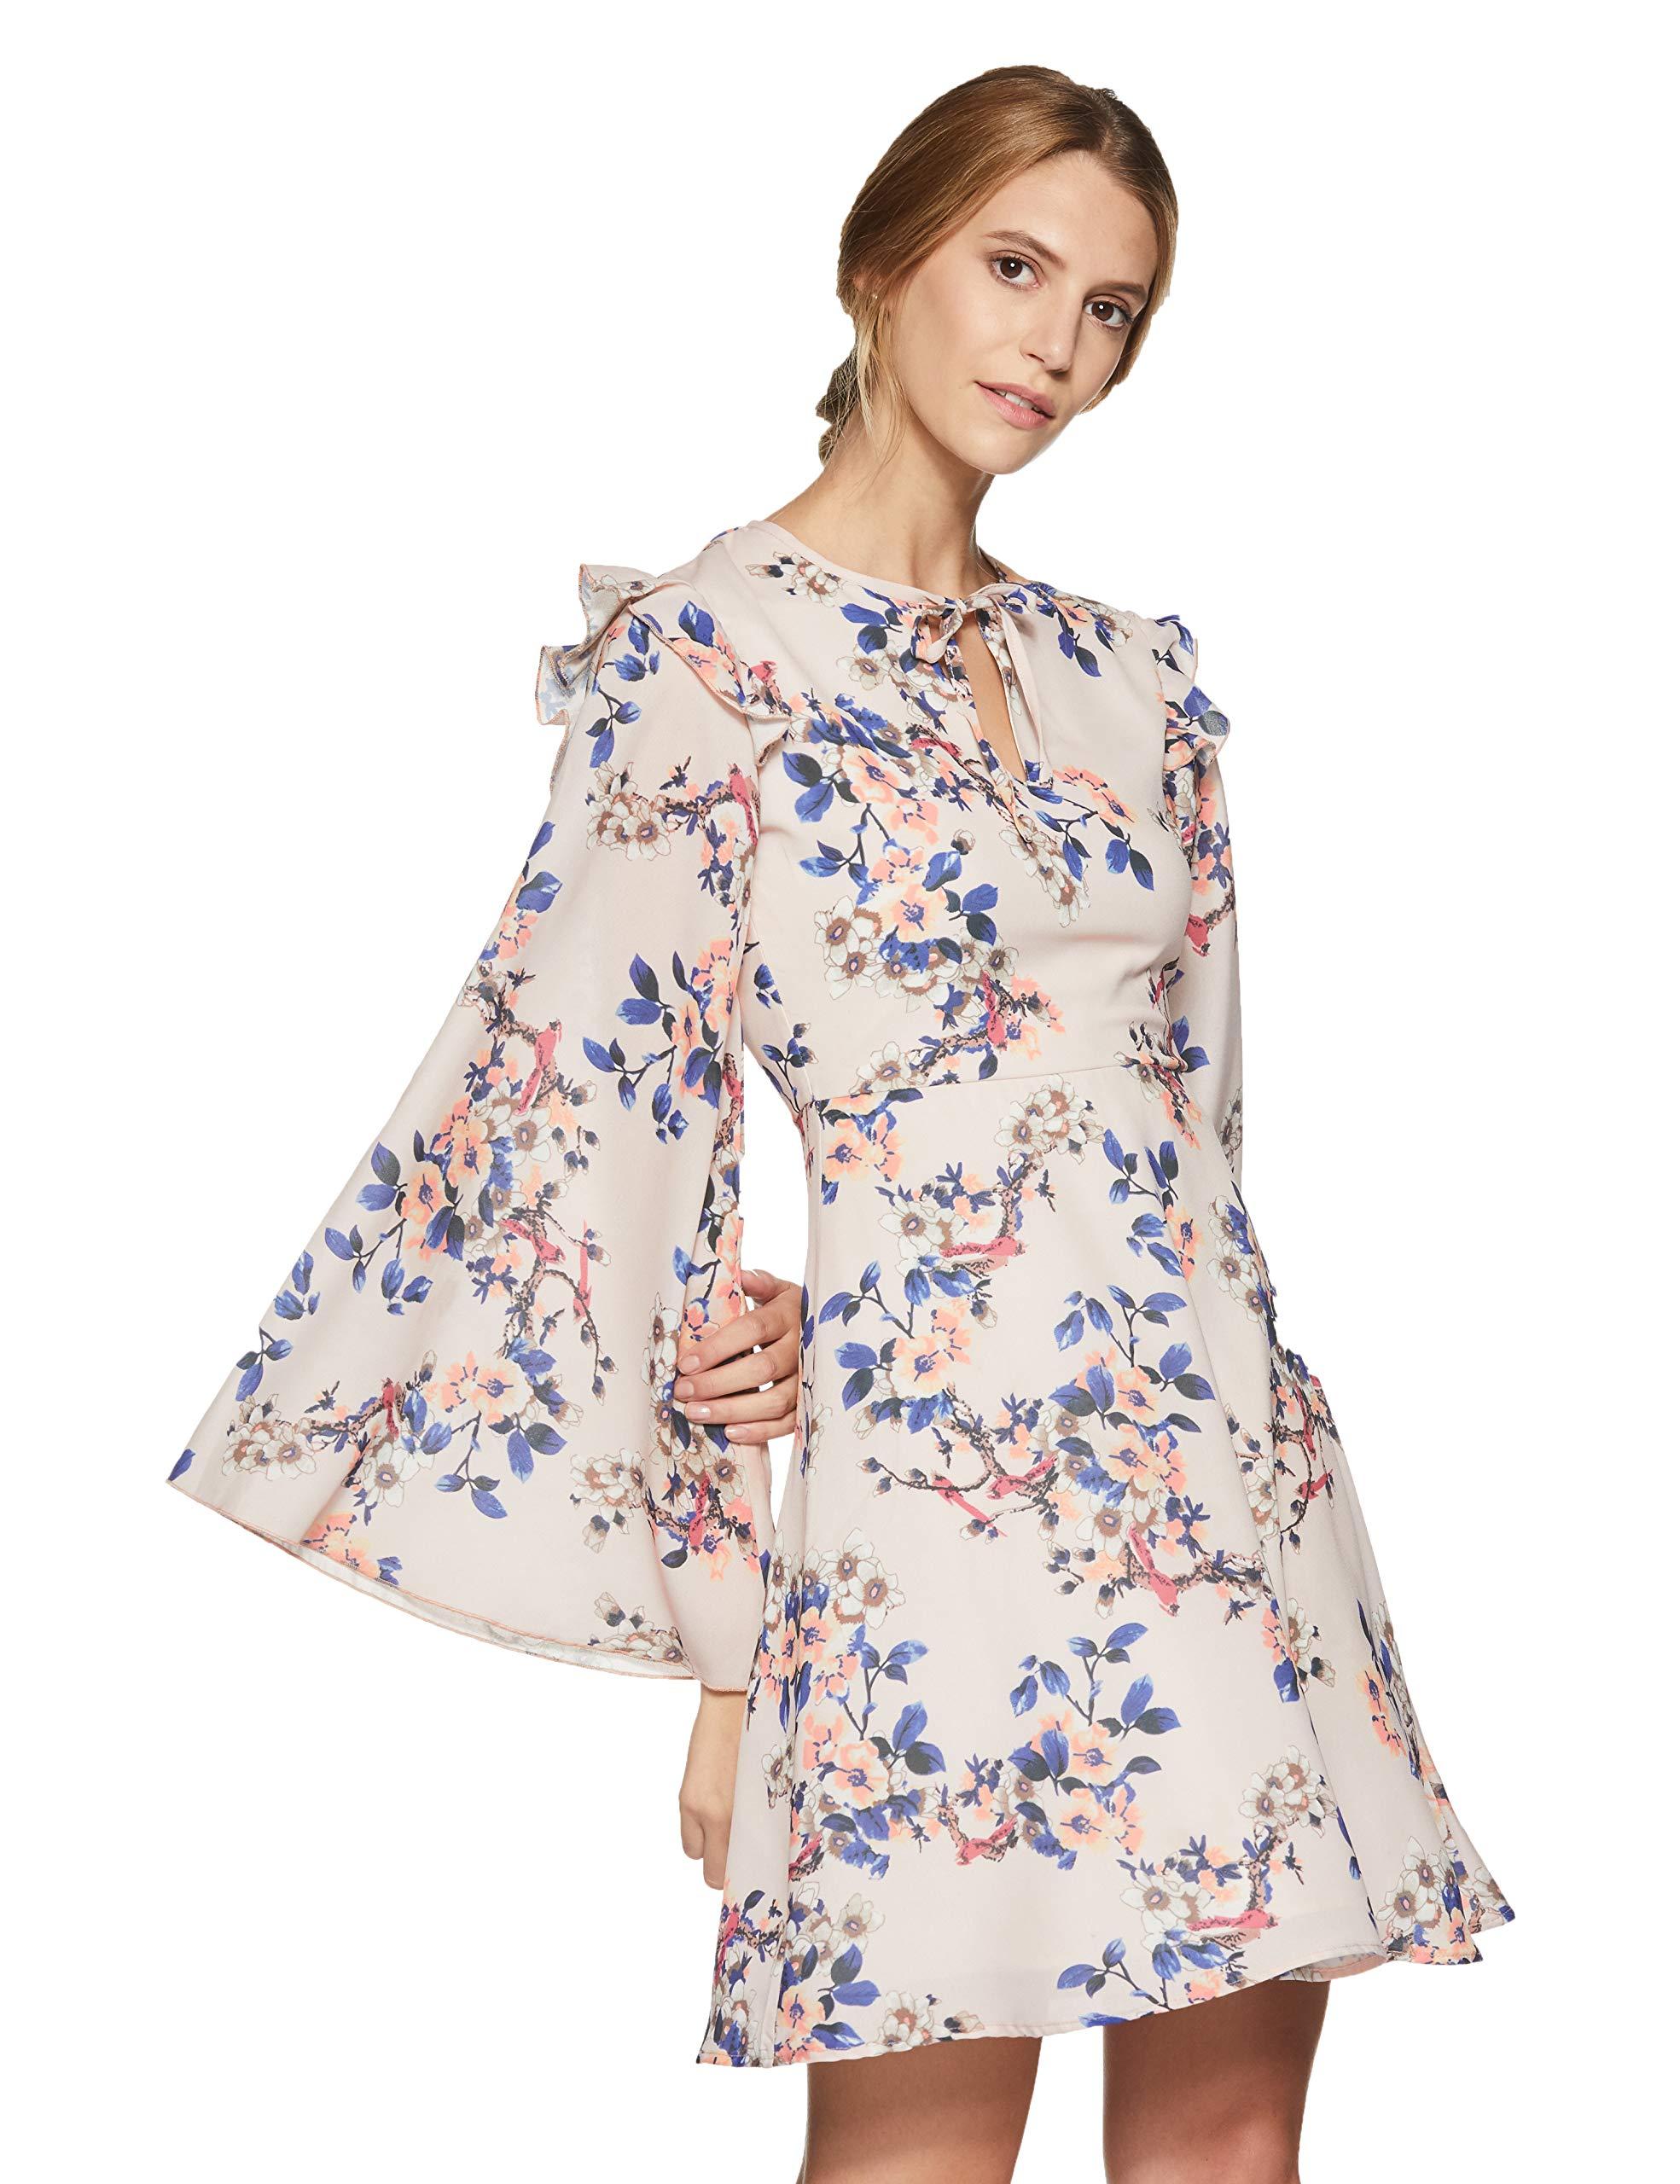 Stalk Buy Love Women's Georgette Floral Beverly Bell Sleeved Dress